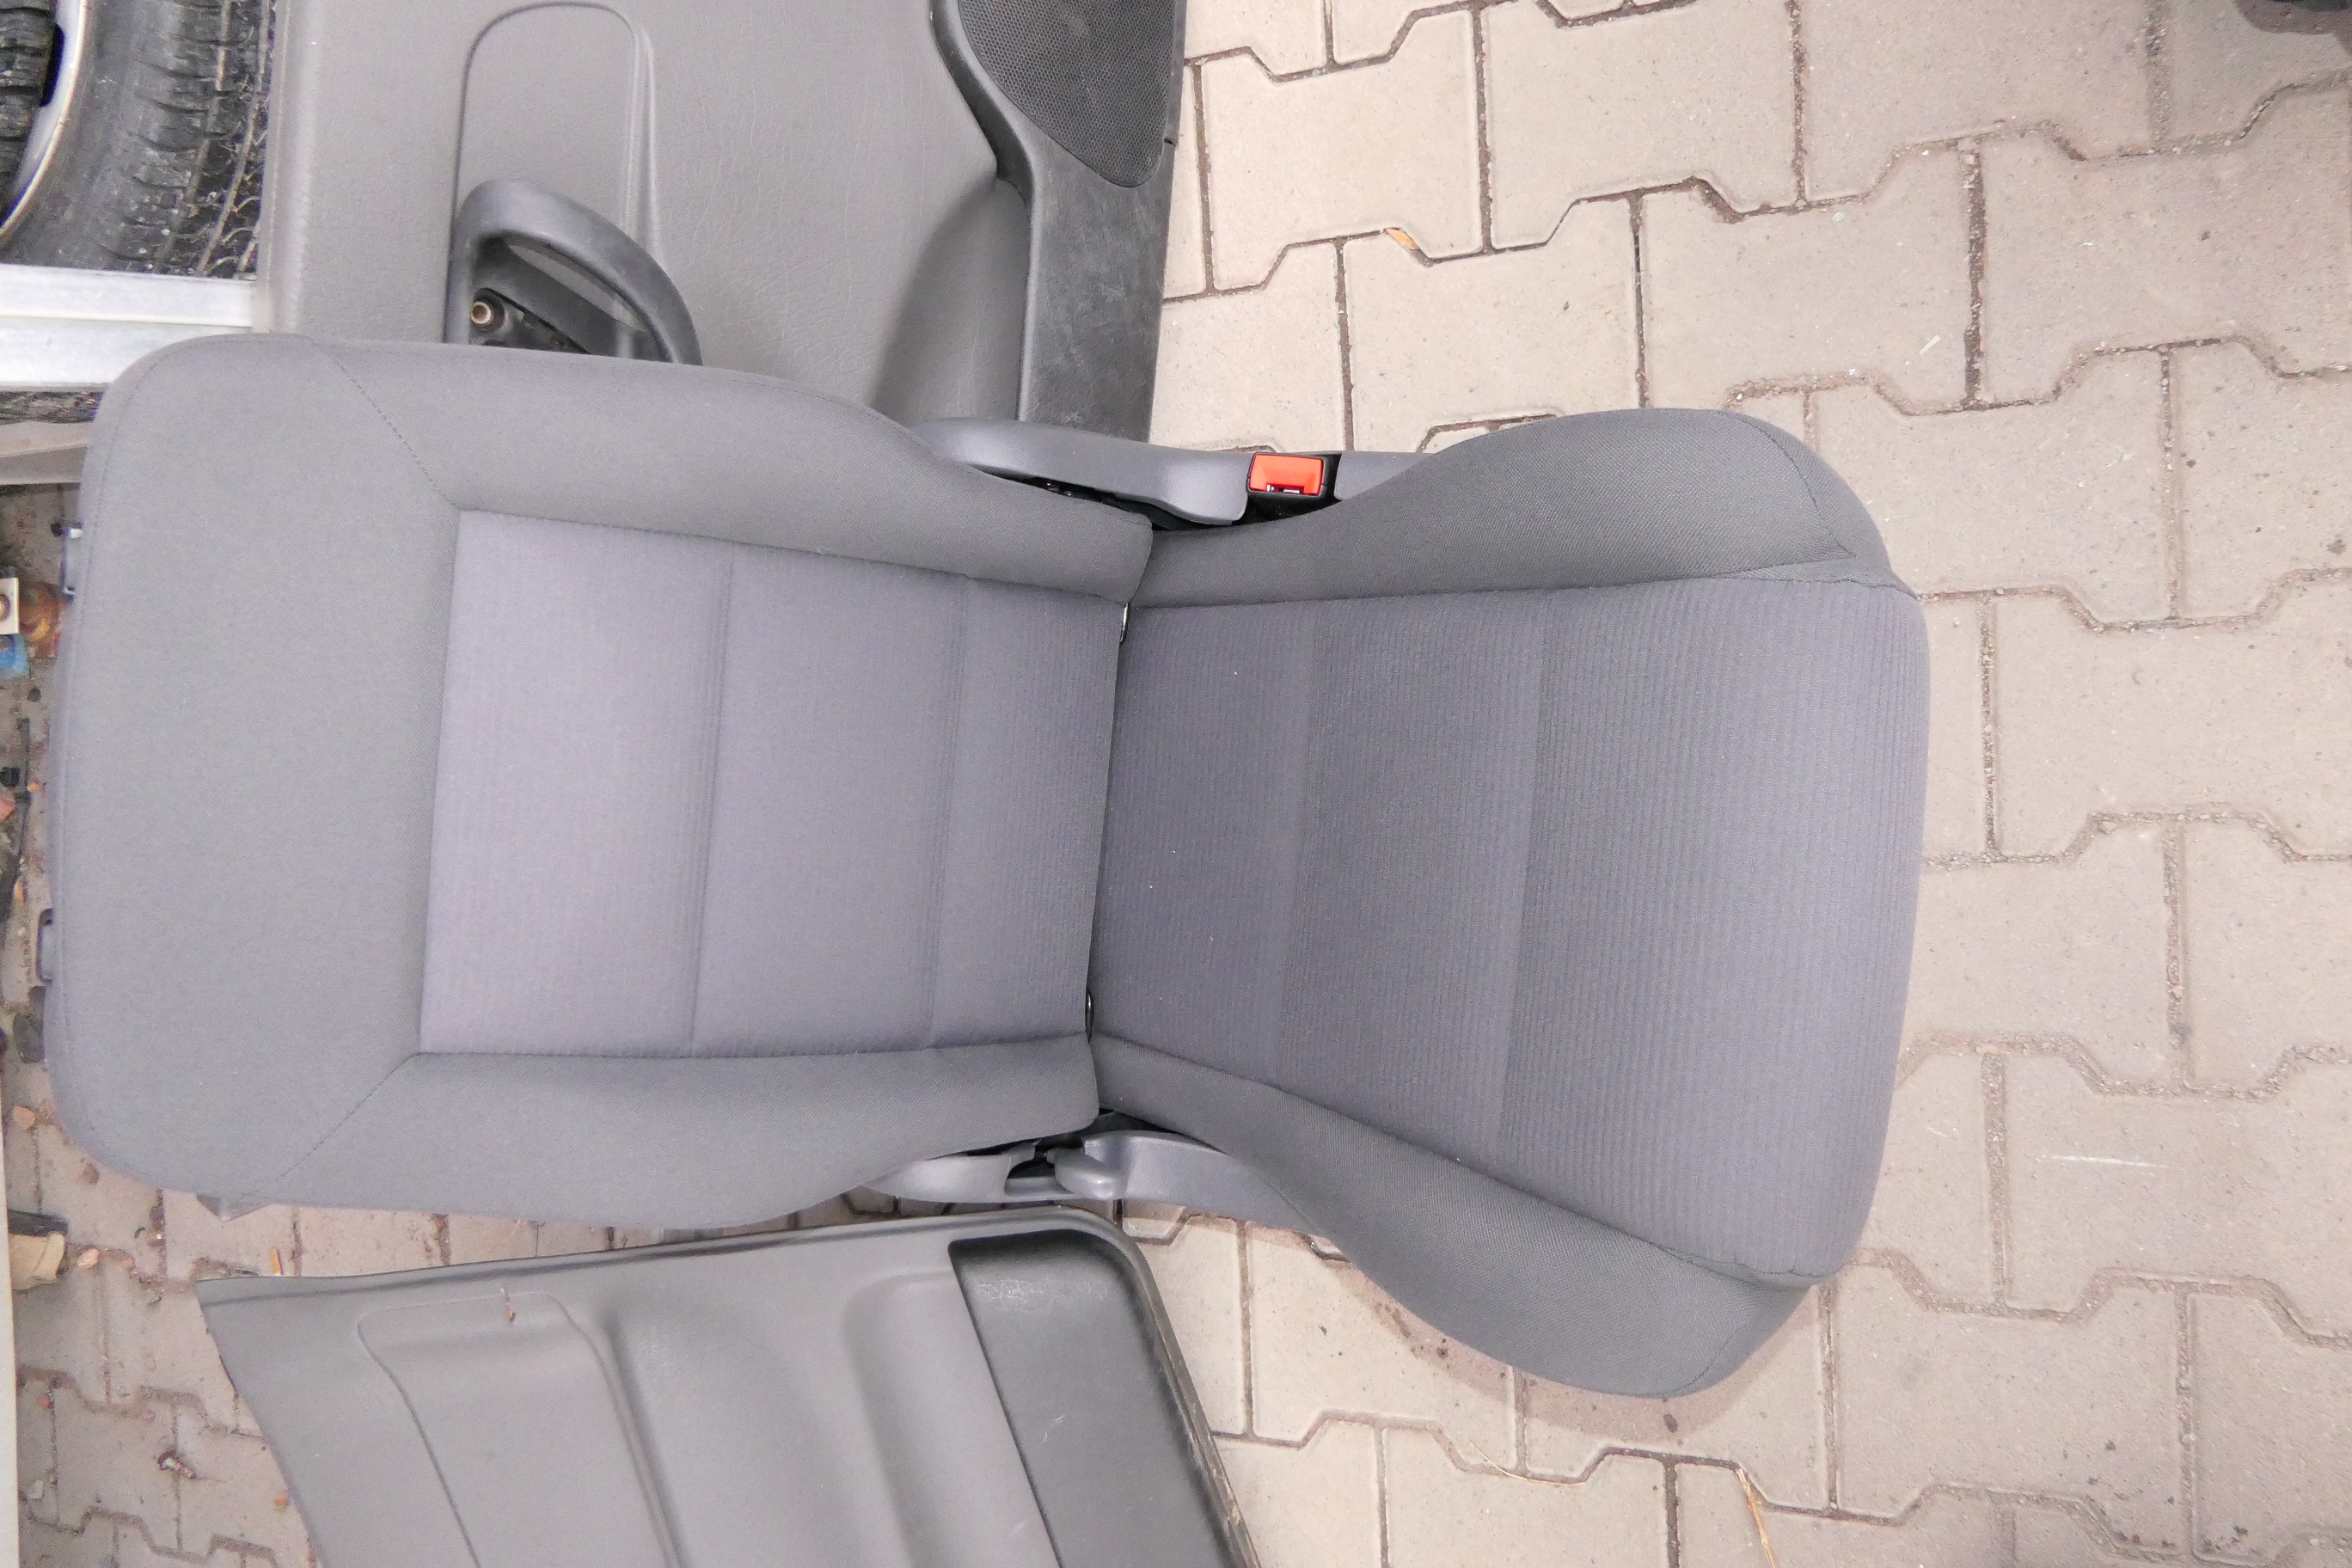 vw sharan 7m ford galaxy 1x sitz hinten rechts r cksitz 6. Black Bedroom Furniture Sets. Home Design Ideas